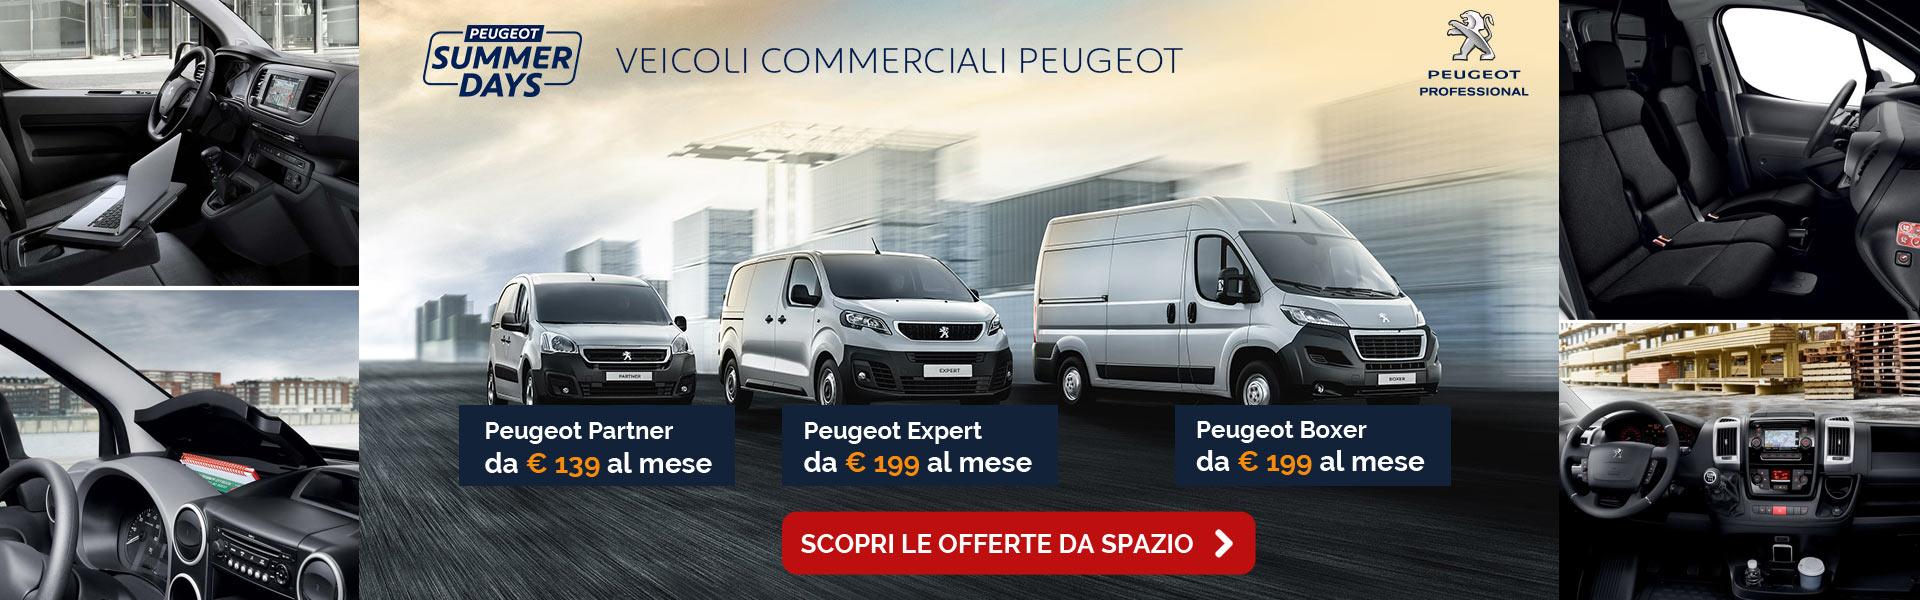 Peugeot Summerdays